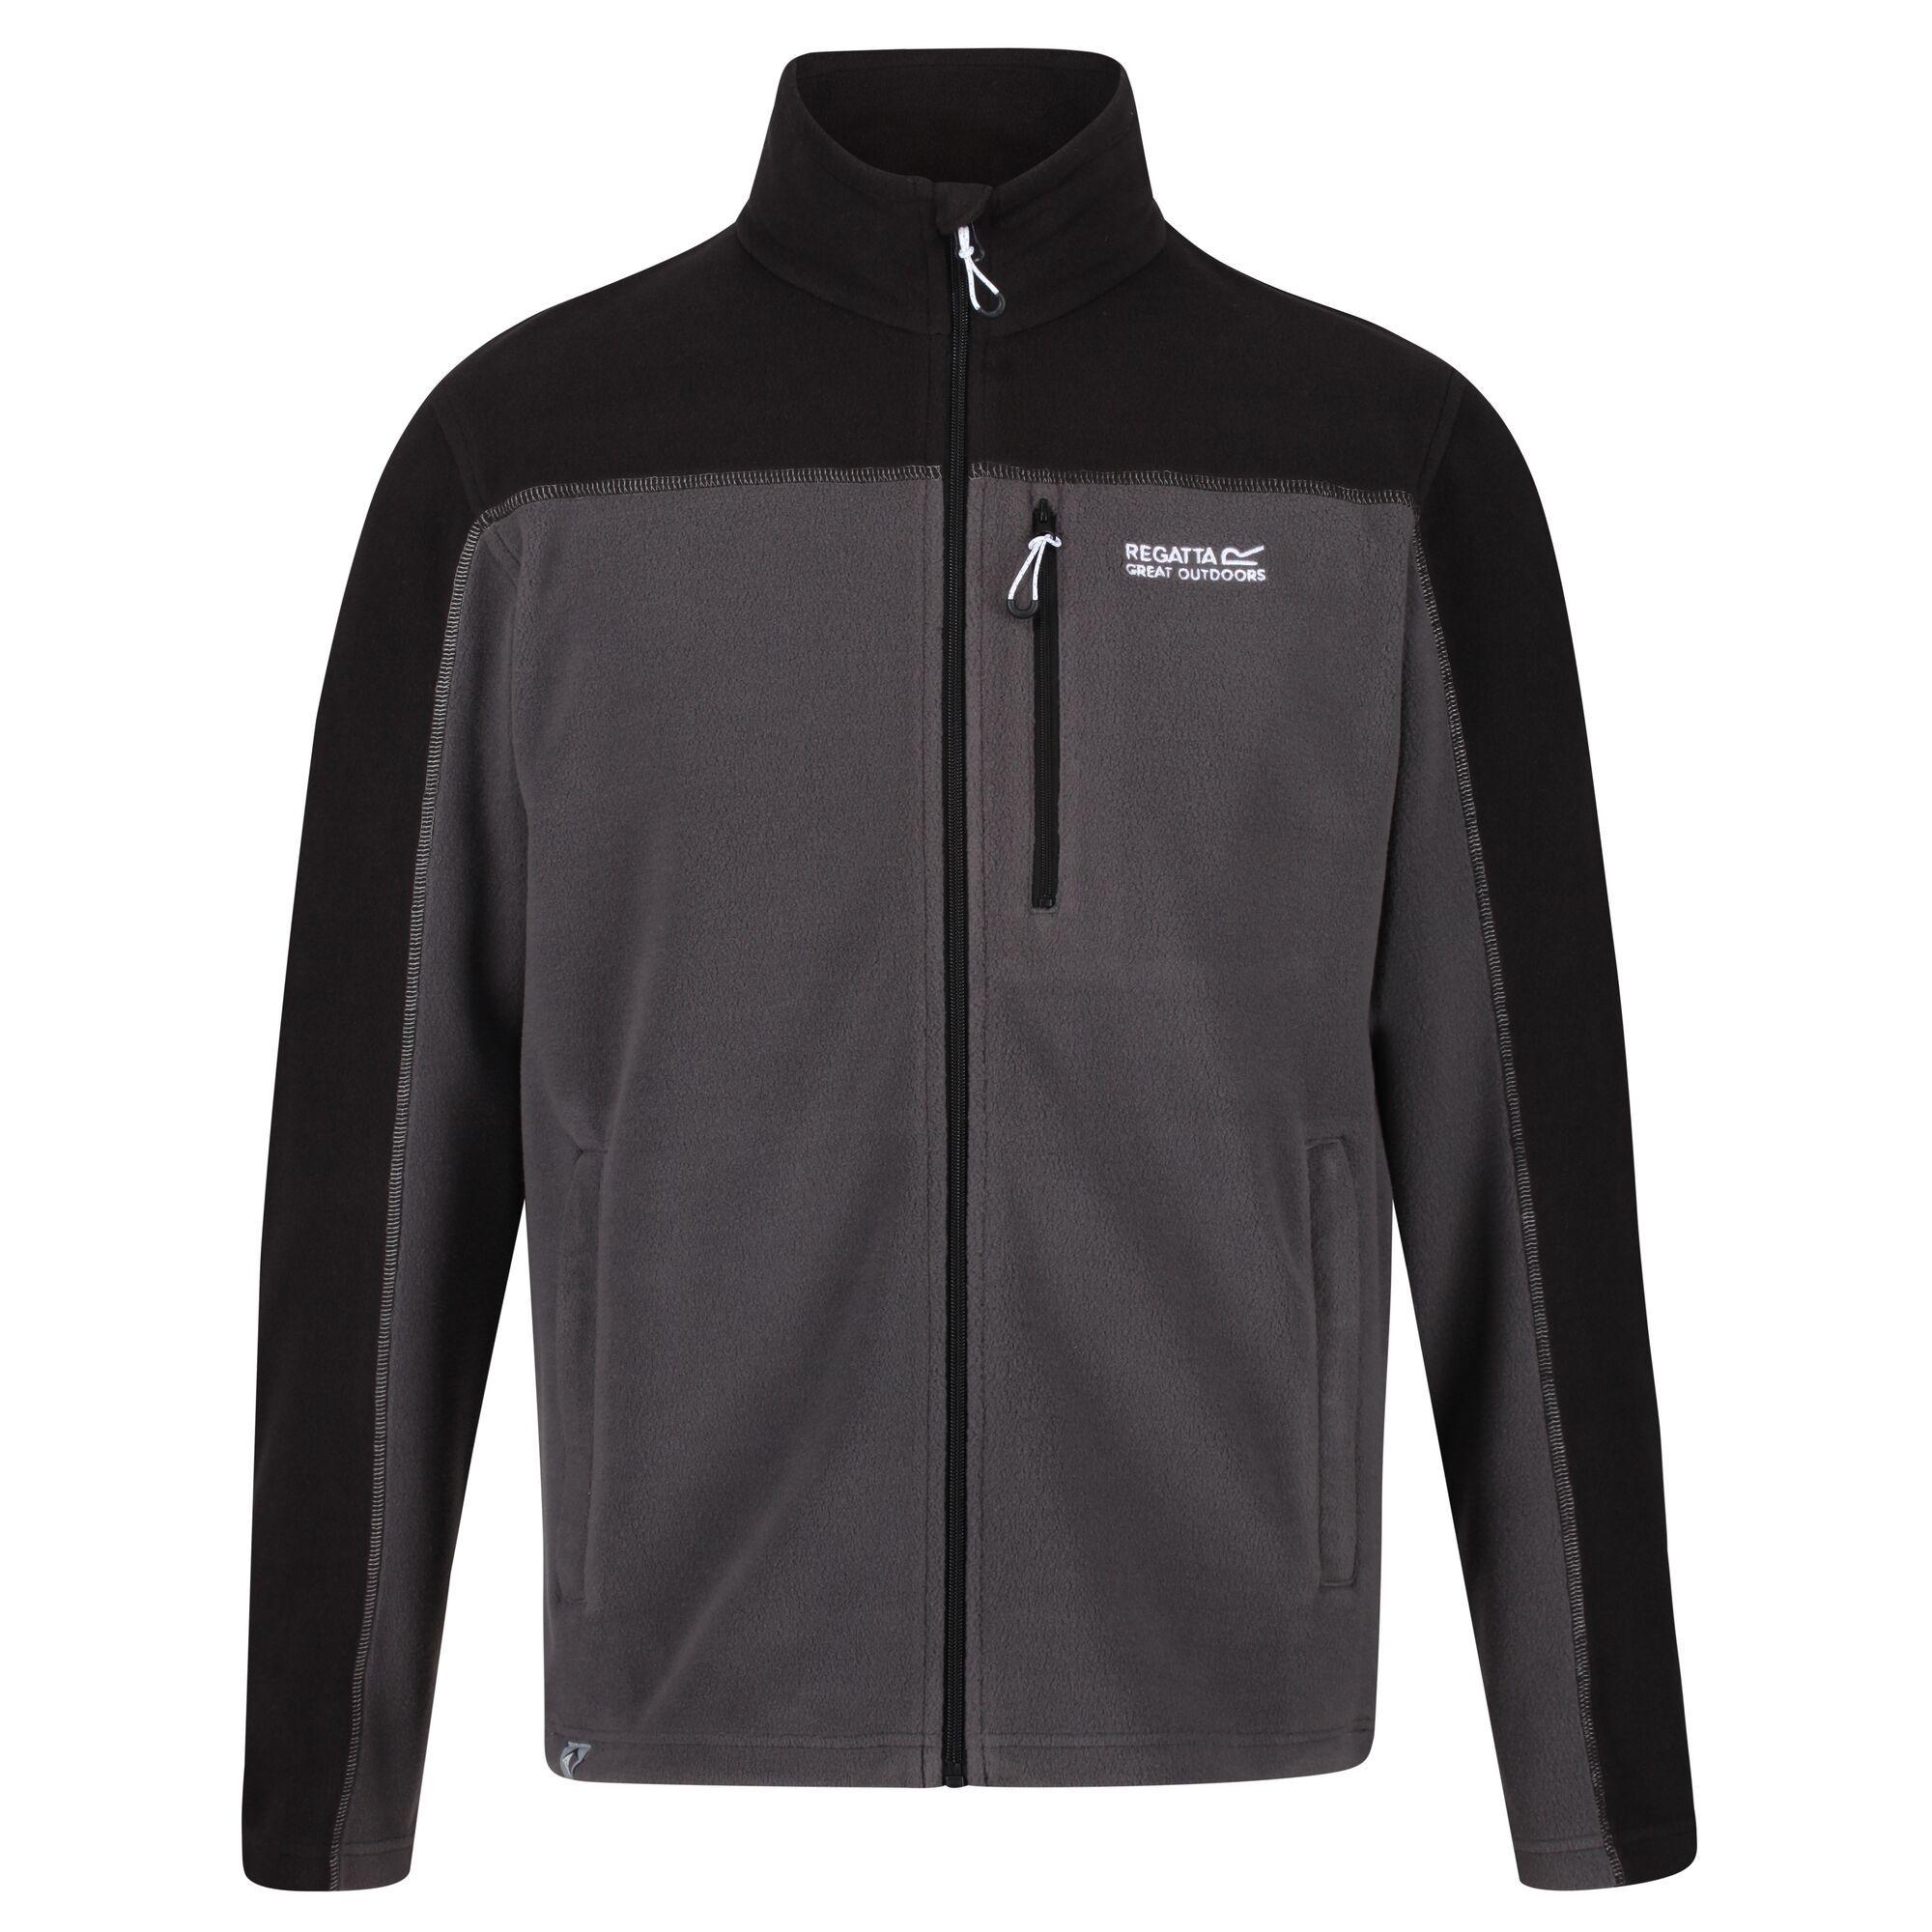 thumbnail 8 - Regatta Fellard Mens Lightweight Full Zip Warm Walking Fleece Jacket RRP £30